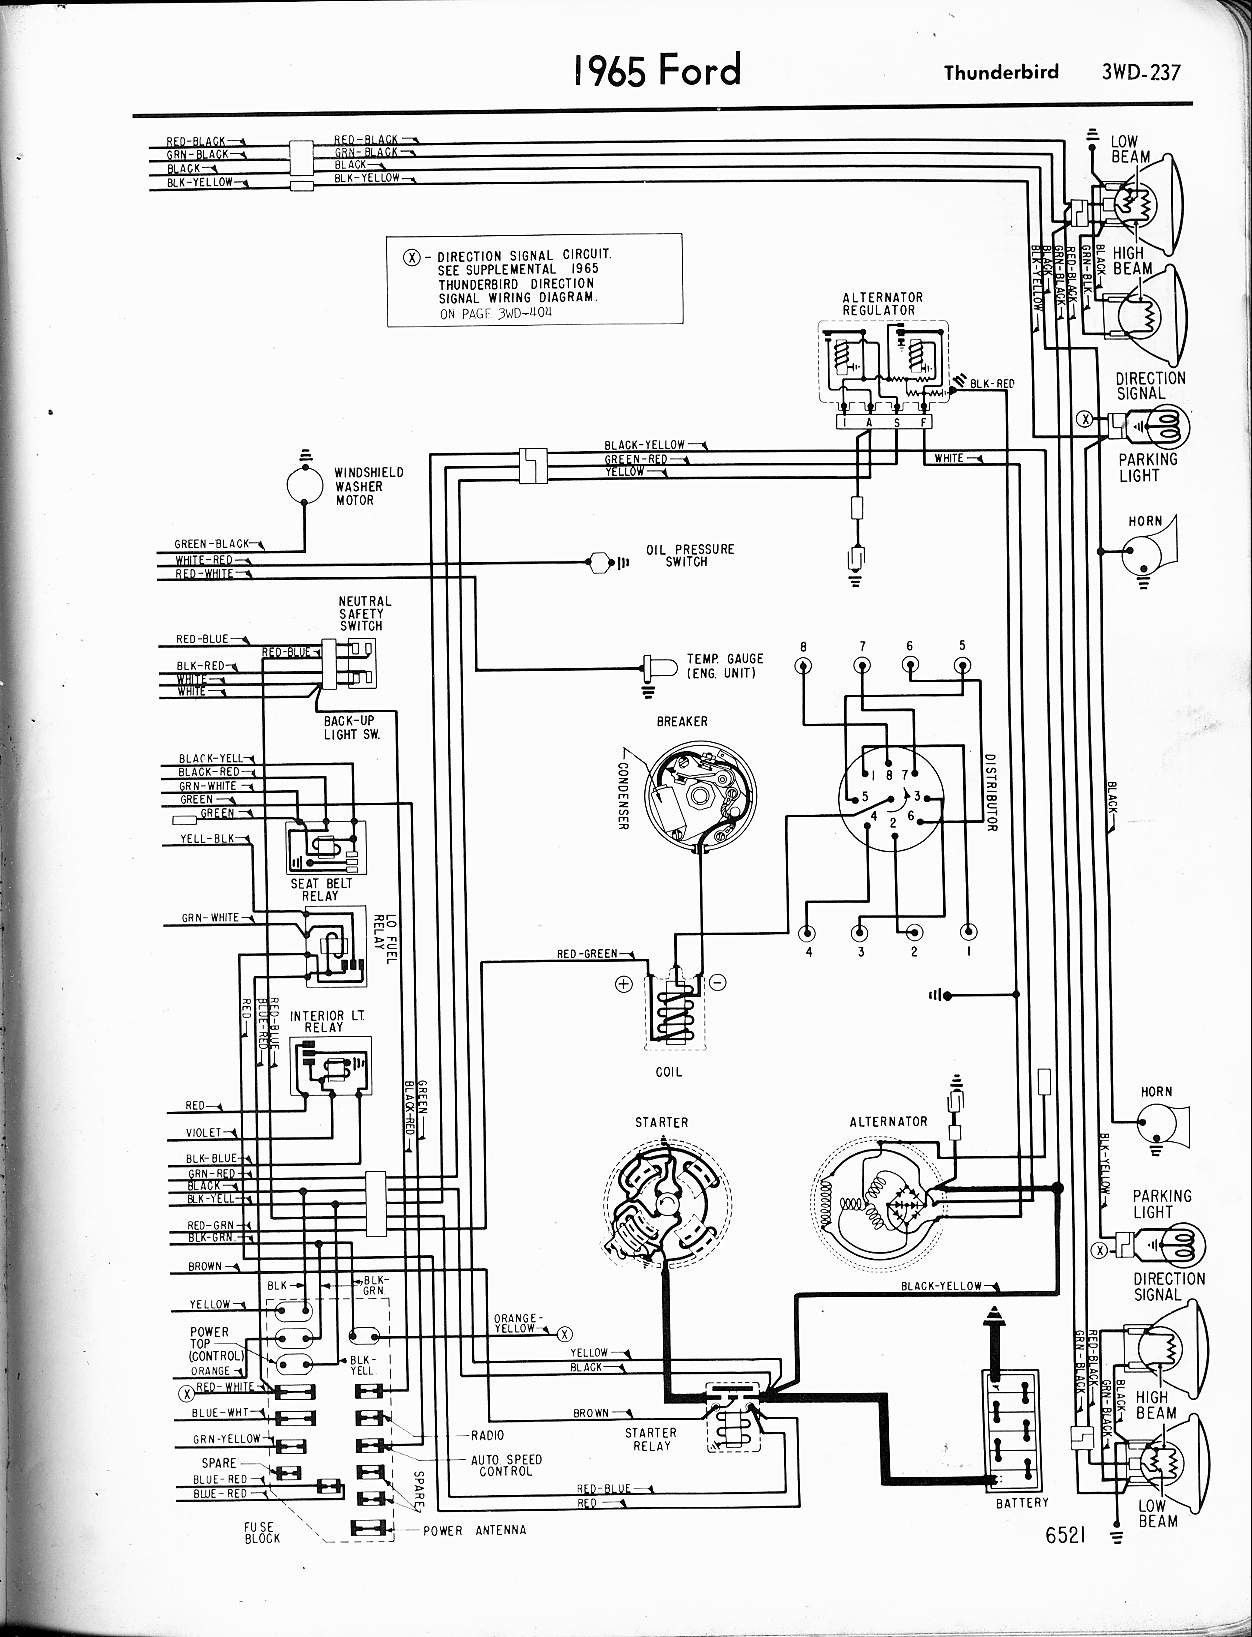 YC_2888] 65 Lincoln Continental Diagram Wiring Schematic Schematic WiringTool Unre Bedr Nful Gho Vira Mohammedshrine Librar Wiring 101